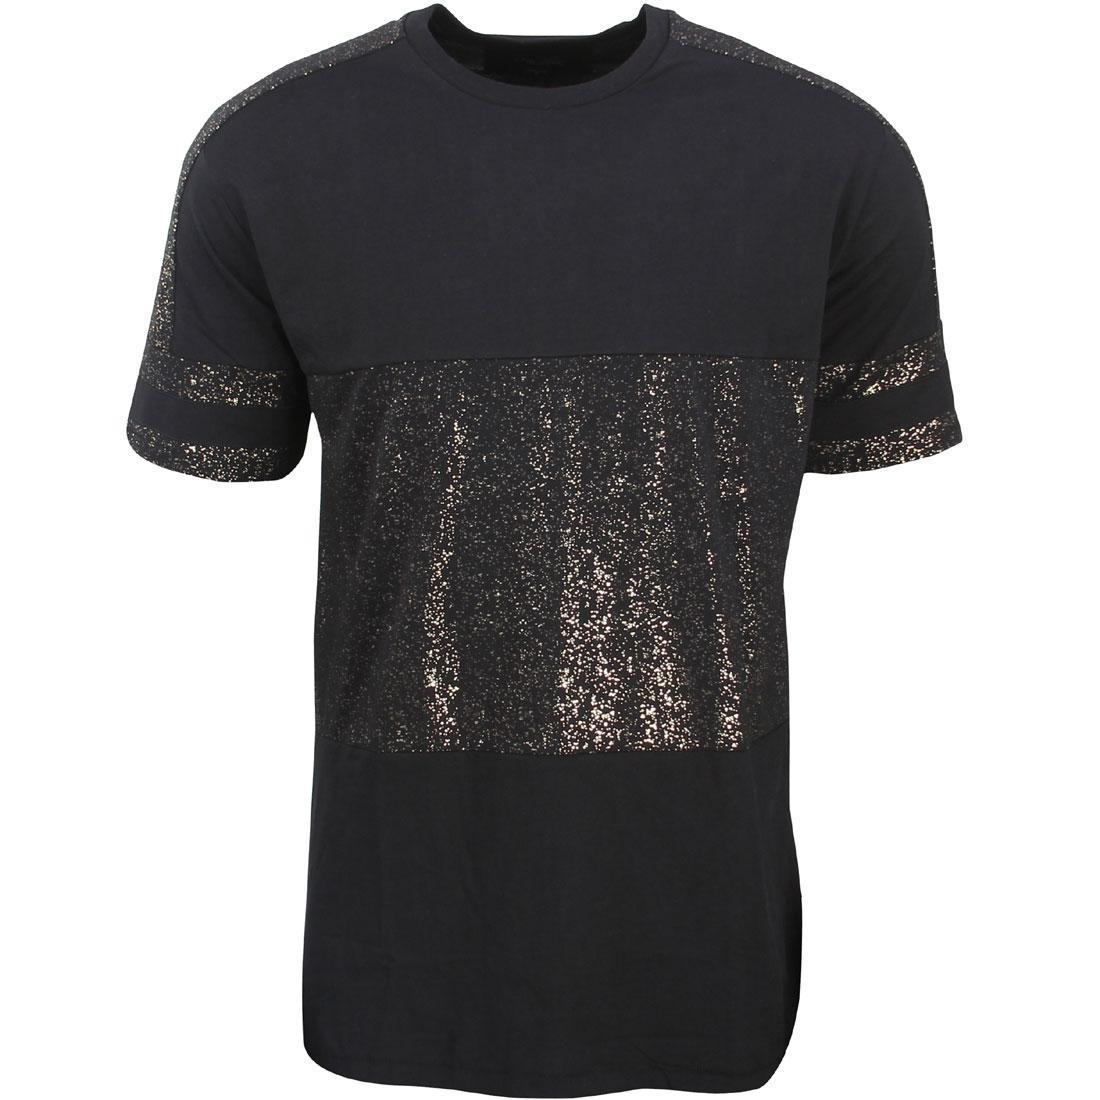 Tシャツ メンズファッション トップス カットソー メンズ 【 Zanerobe Men Montage Lineback Tee (black / Gold) 】 Black / Gold